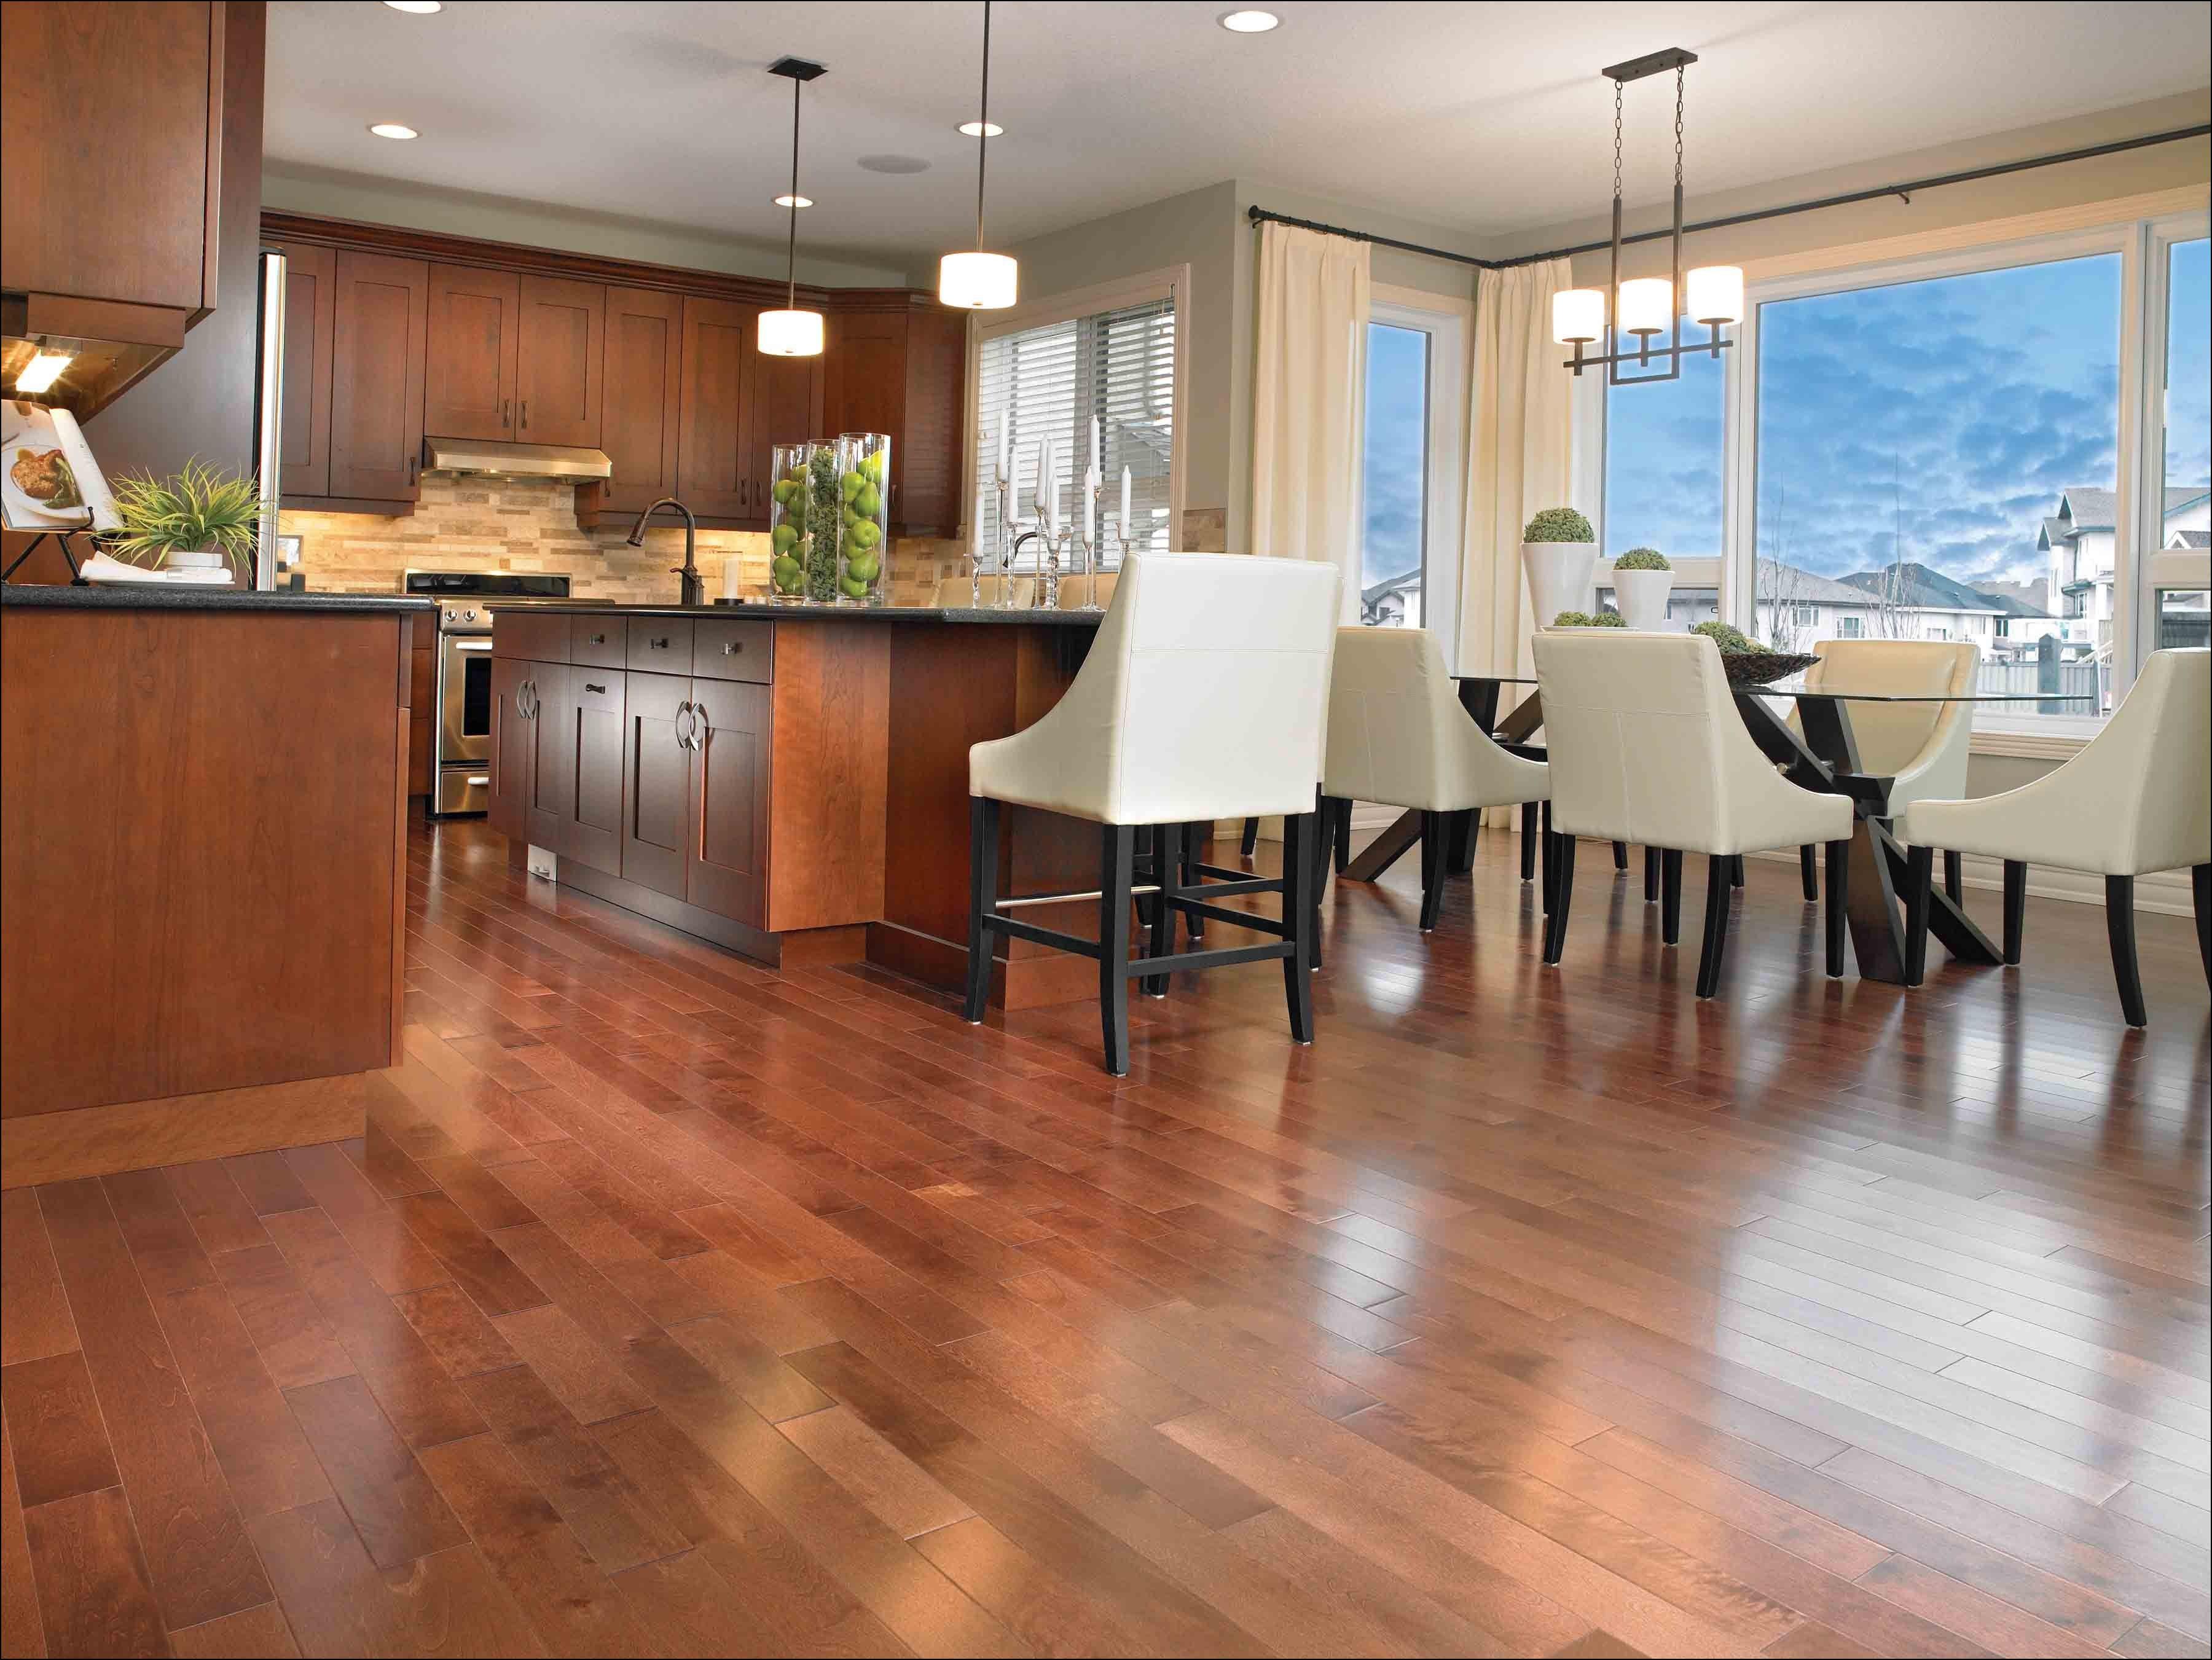 bruce solid oak hardwood flooring reviews of hardwood flooring suppliers france flooring ideas with hardwood flooring installation san diego images 54 best exotic flooring images on pinterest of hardwood flooring